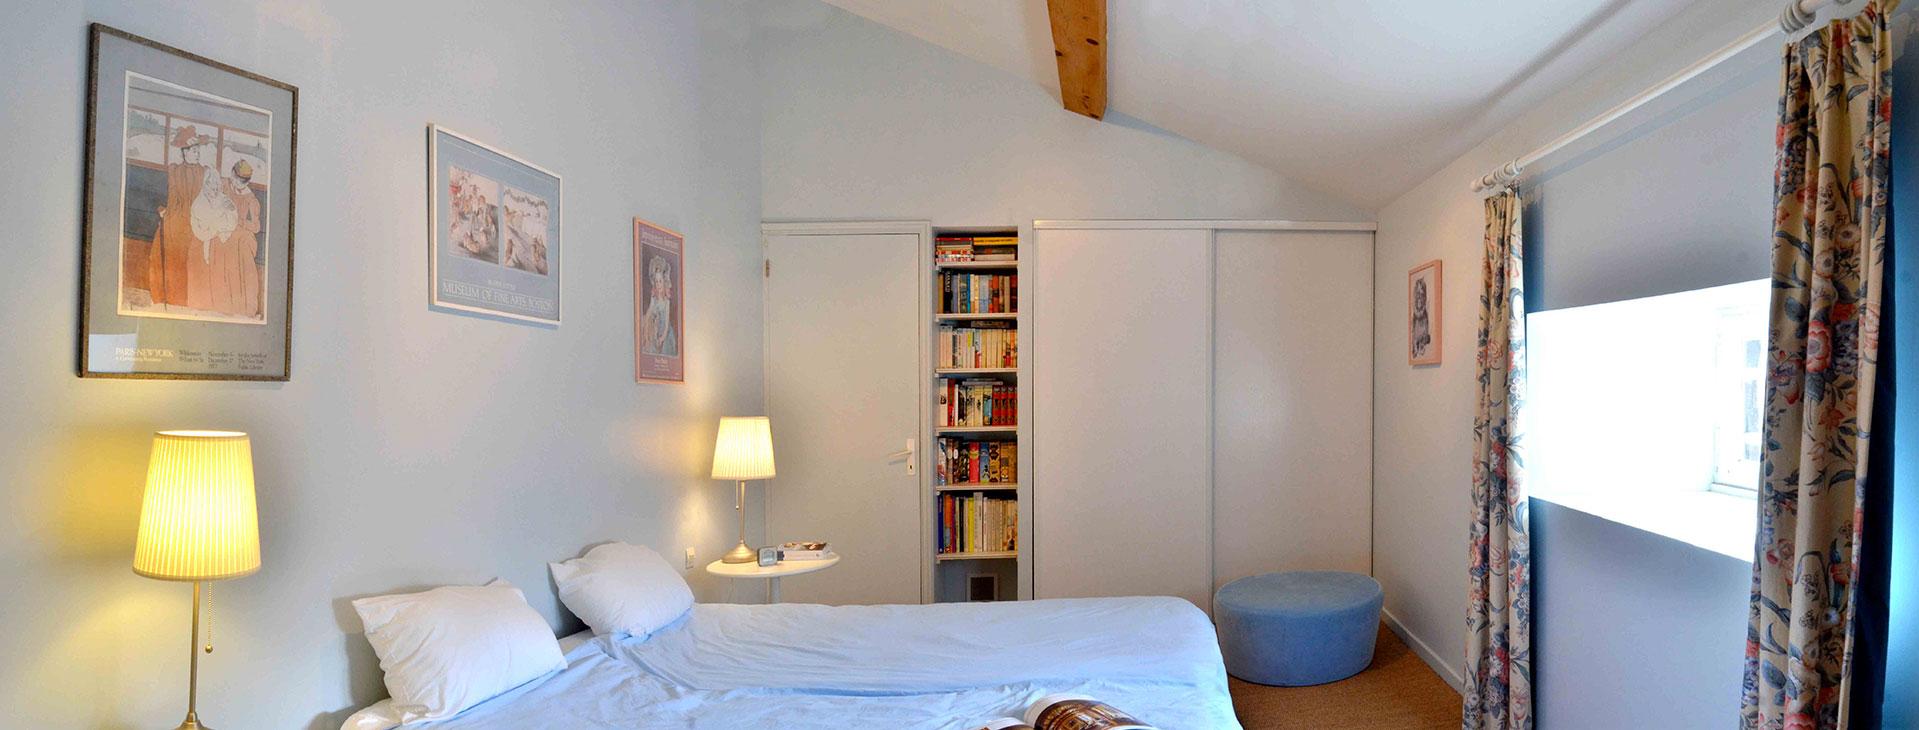 Chambre boston / Boston bedroom